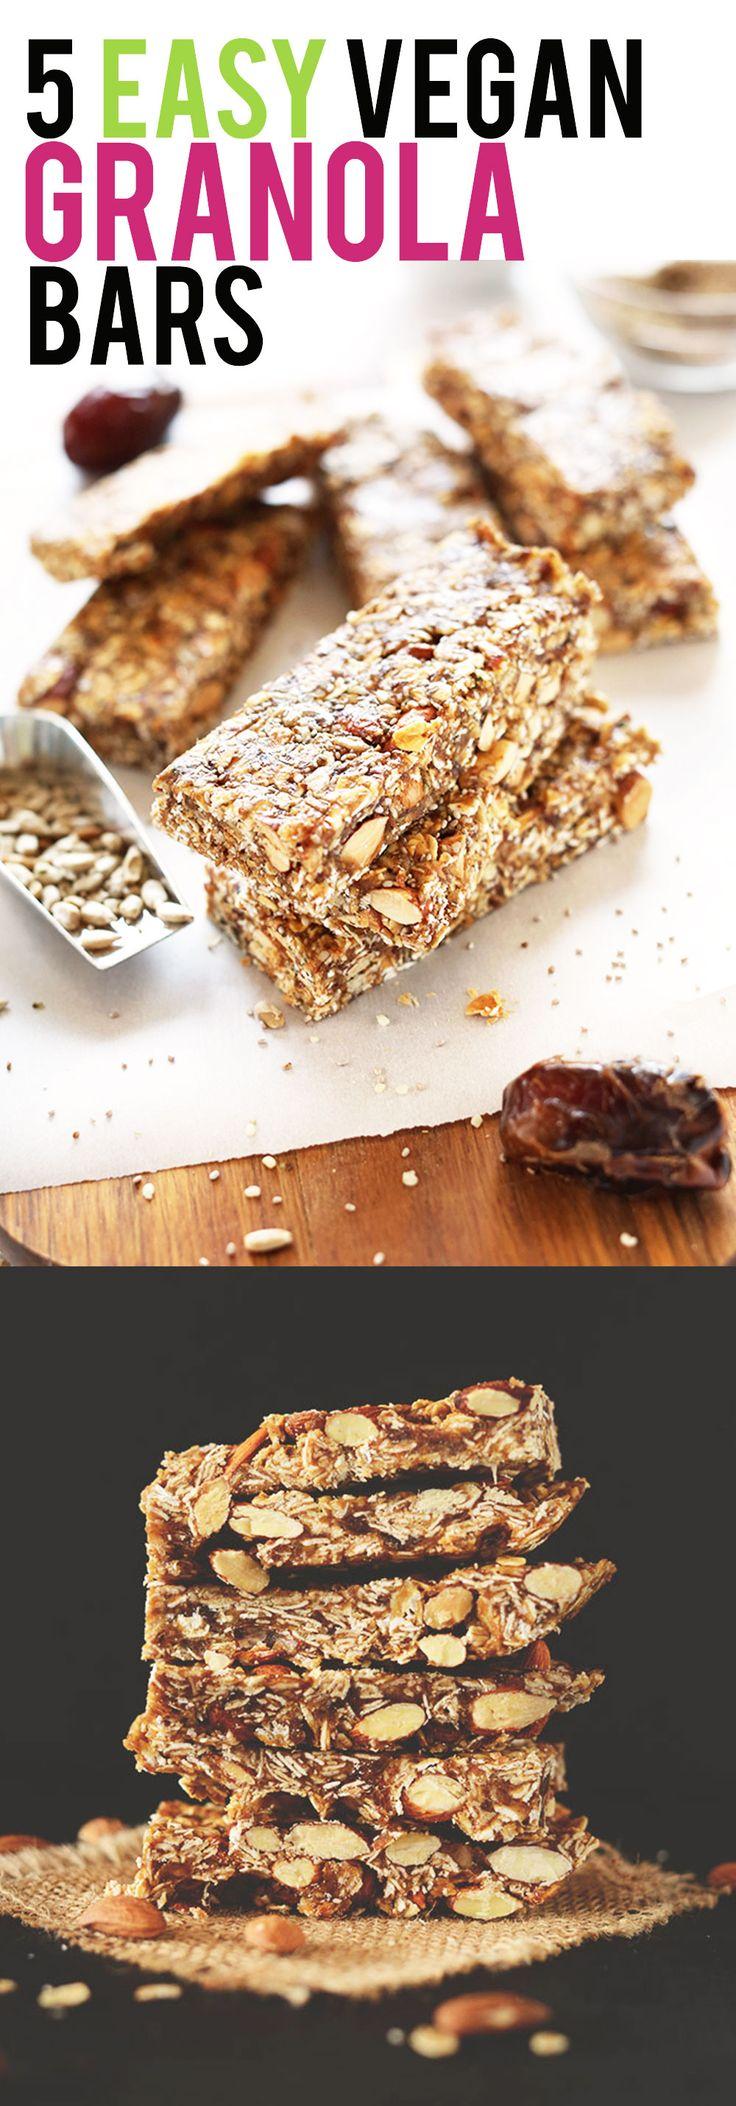 5 EASY Vegan Granola Bar Recipes! Wholesome ingredients with BIG flavor. #vegan